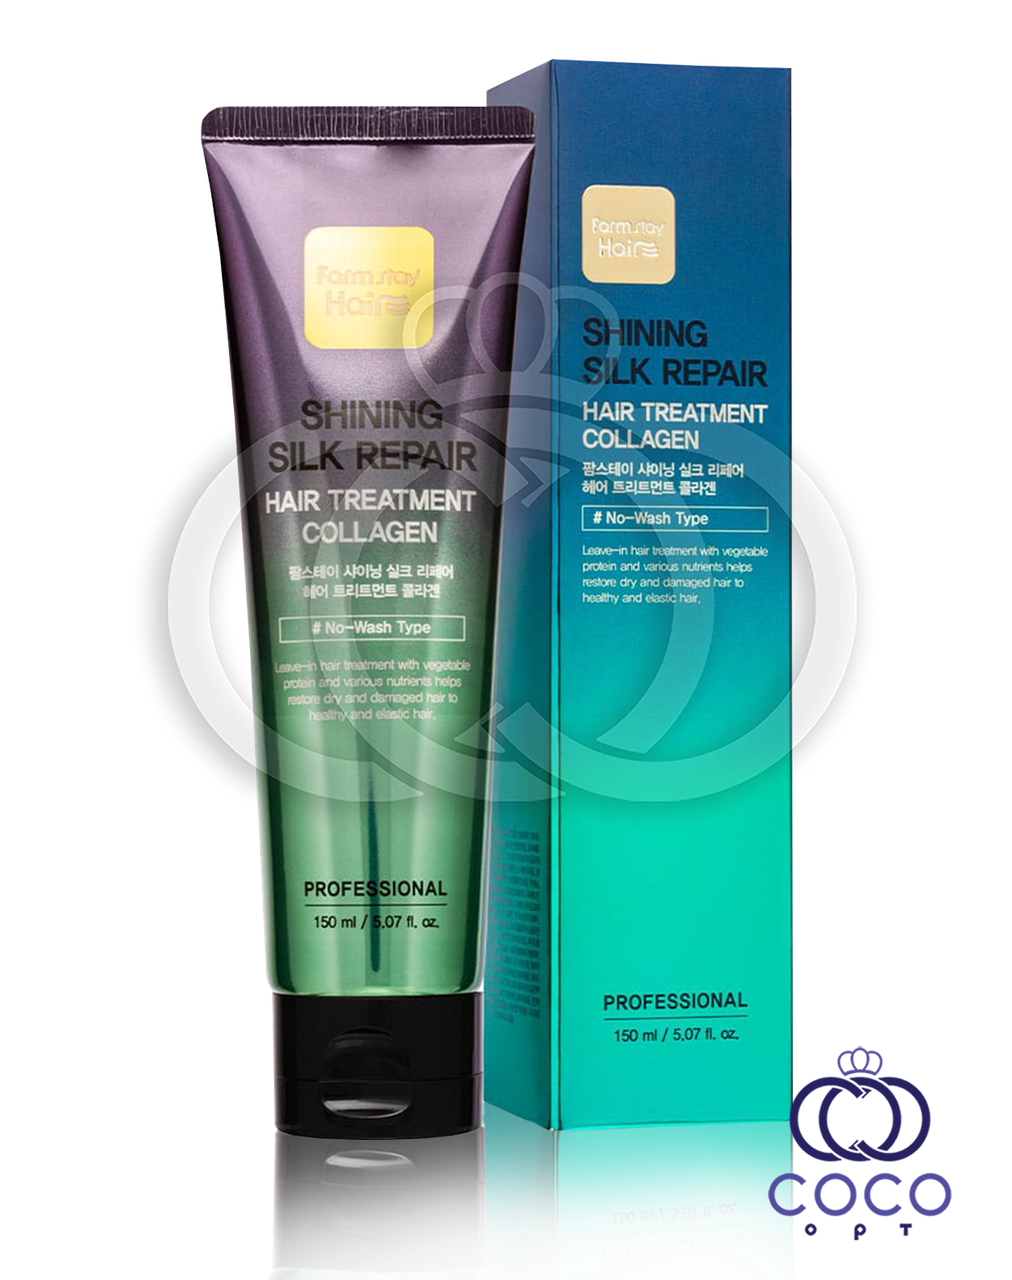 Маска для волос Farm stay Shining Silk Repair Hair Treatment Collagen с коллагеном